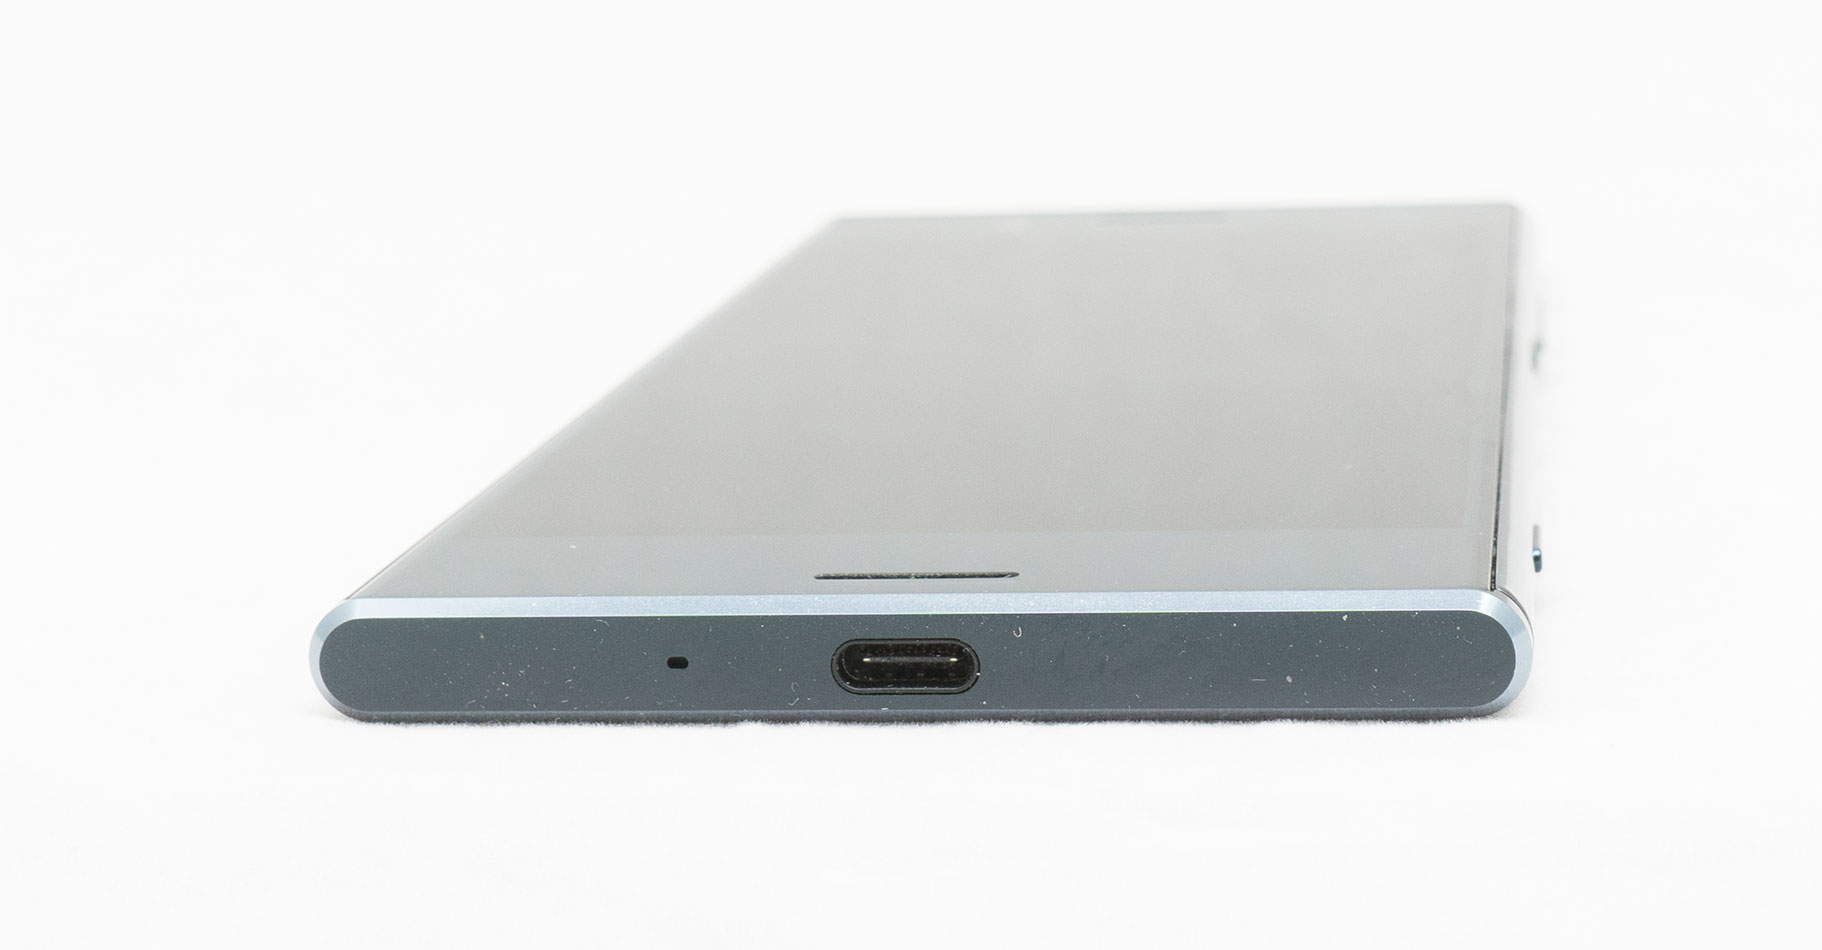 Review: Sony Xperia XZ Premium (G8141) – Pickr